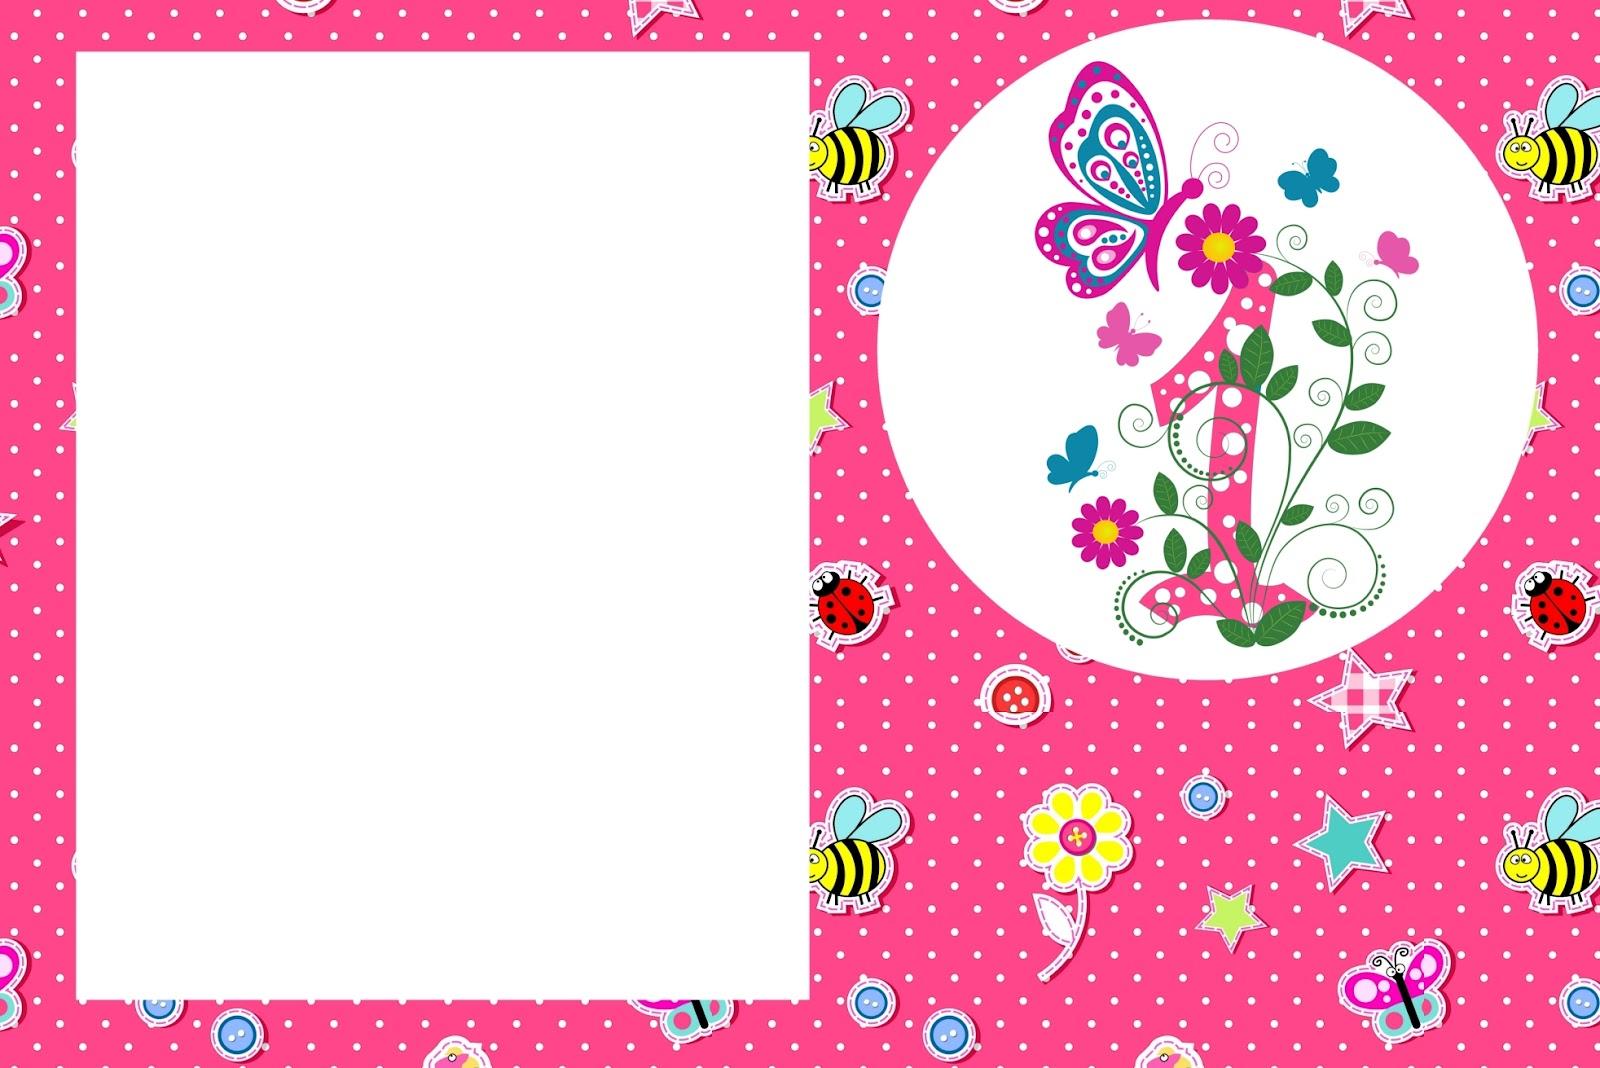 1 Ano Menina Kit Completo Com Molduras Para Convites Rótulos Para